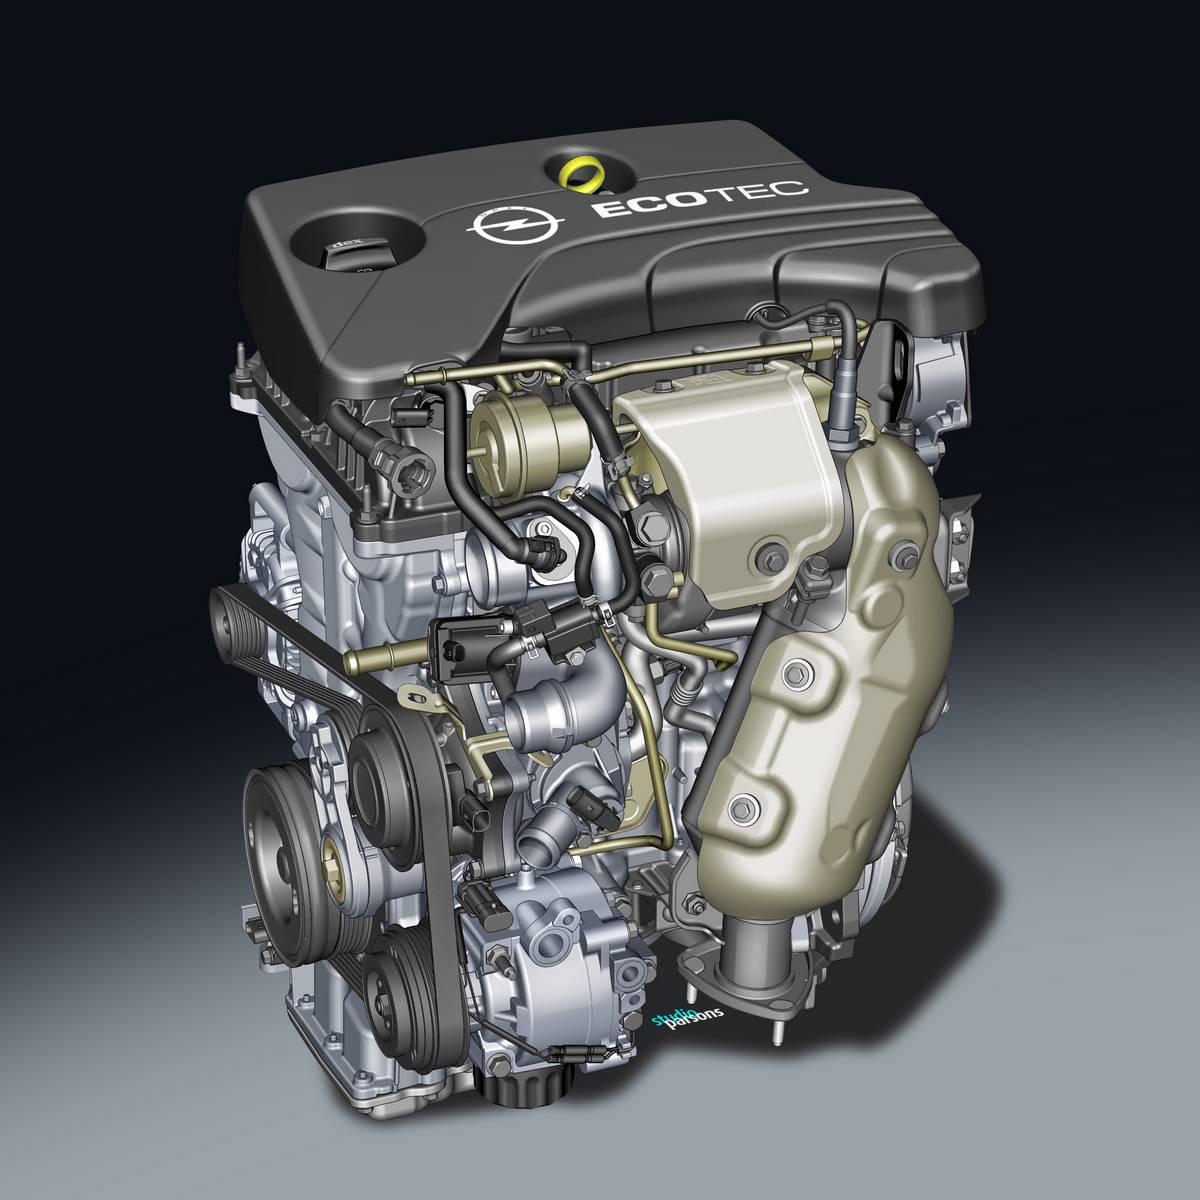 Motor 1.0 de três cilindros Opel que equipará Peugeot e Citroen no Brasil